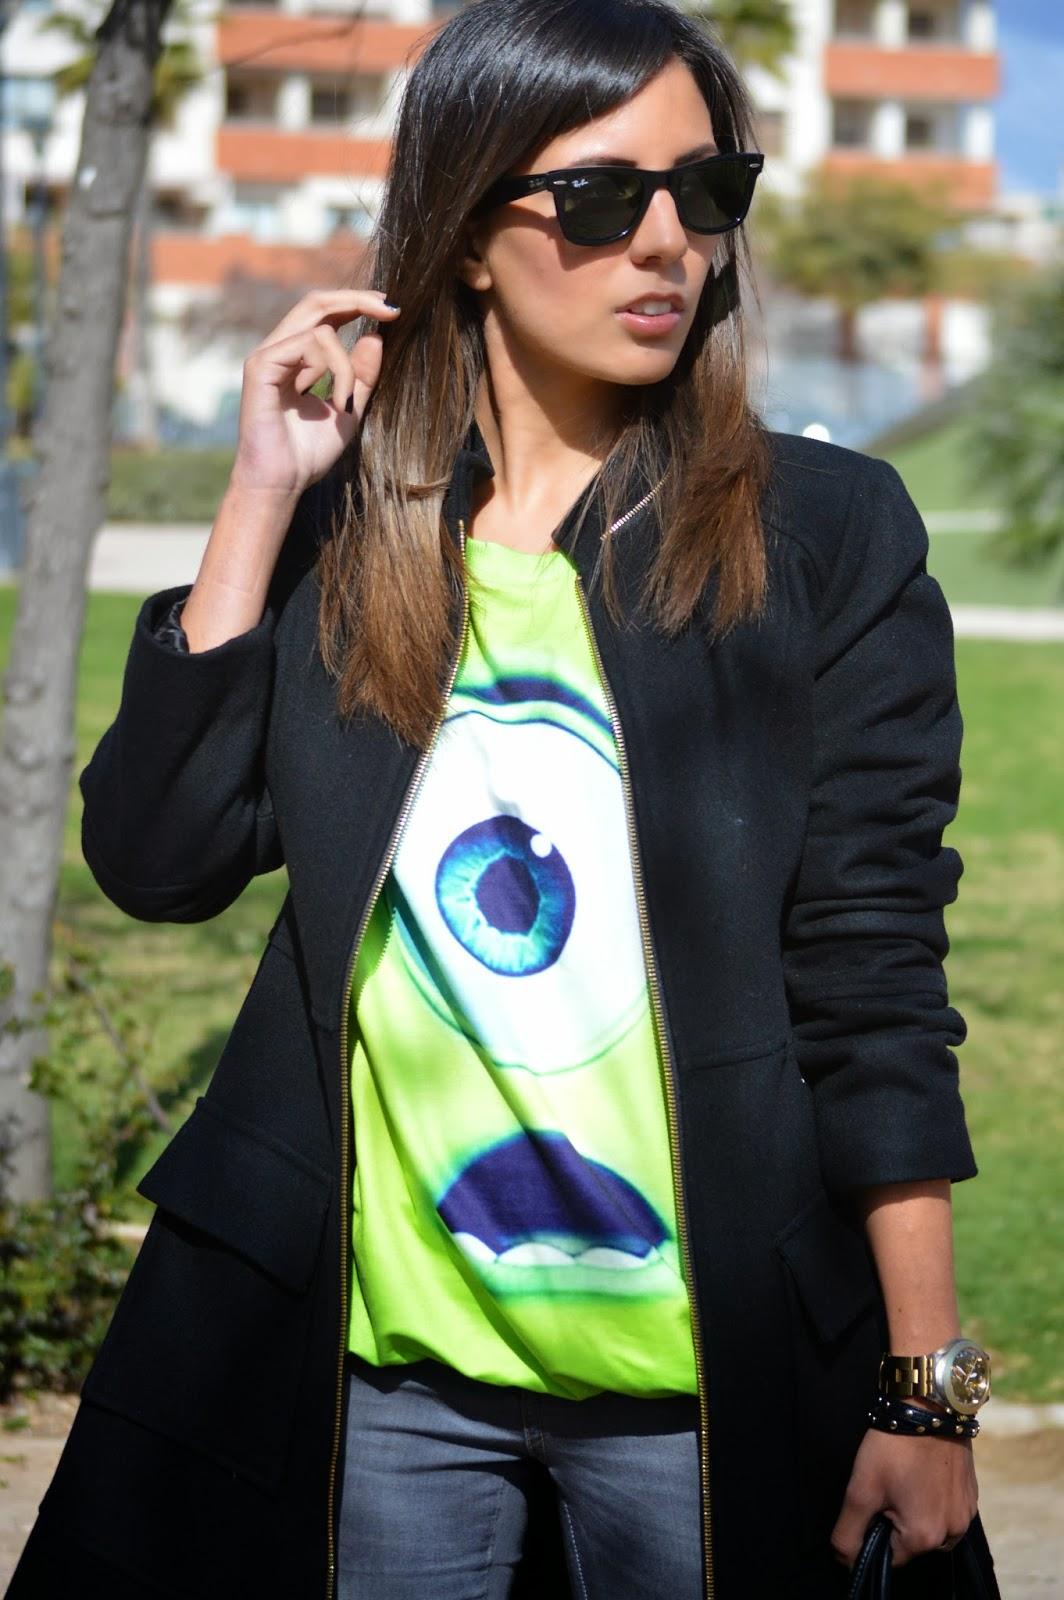 shenside cristina style street style fashion blogger malagueña blogger mañagueña outfit look inspirations moda tendencias stylekiu gorgeous lovely ootd suiteblanco purificacion garcia